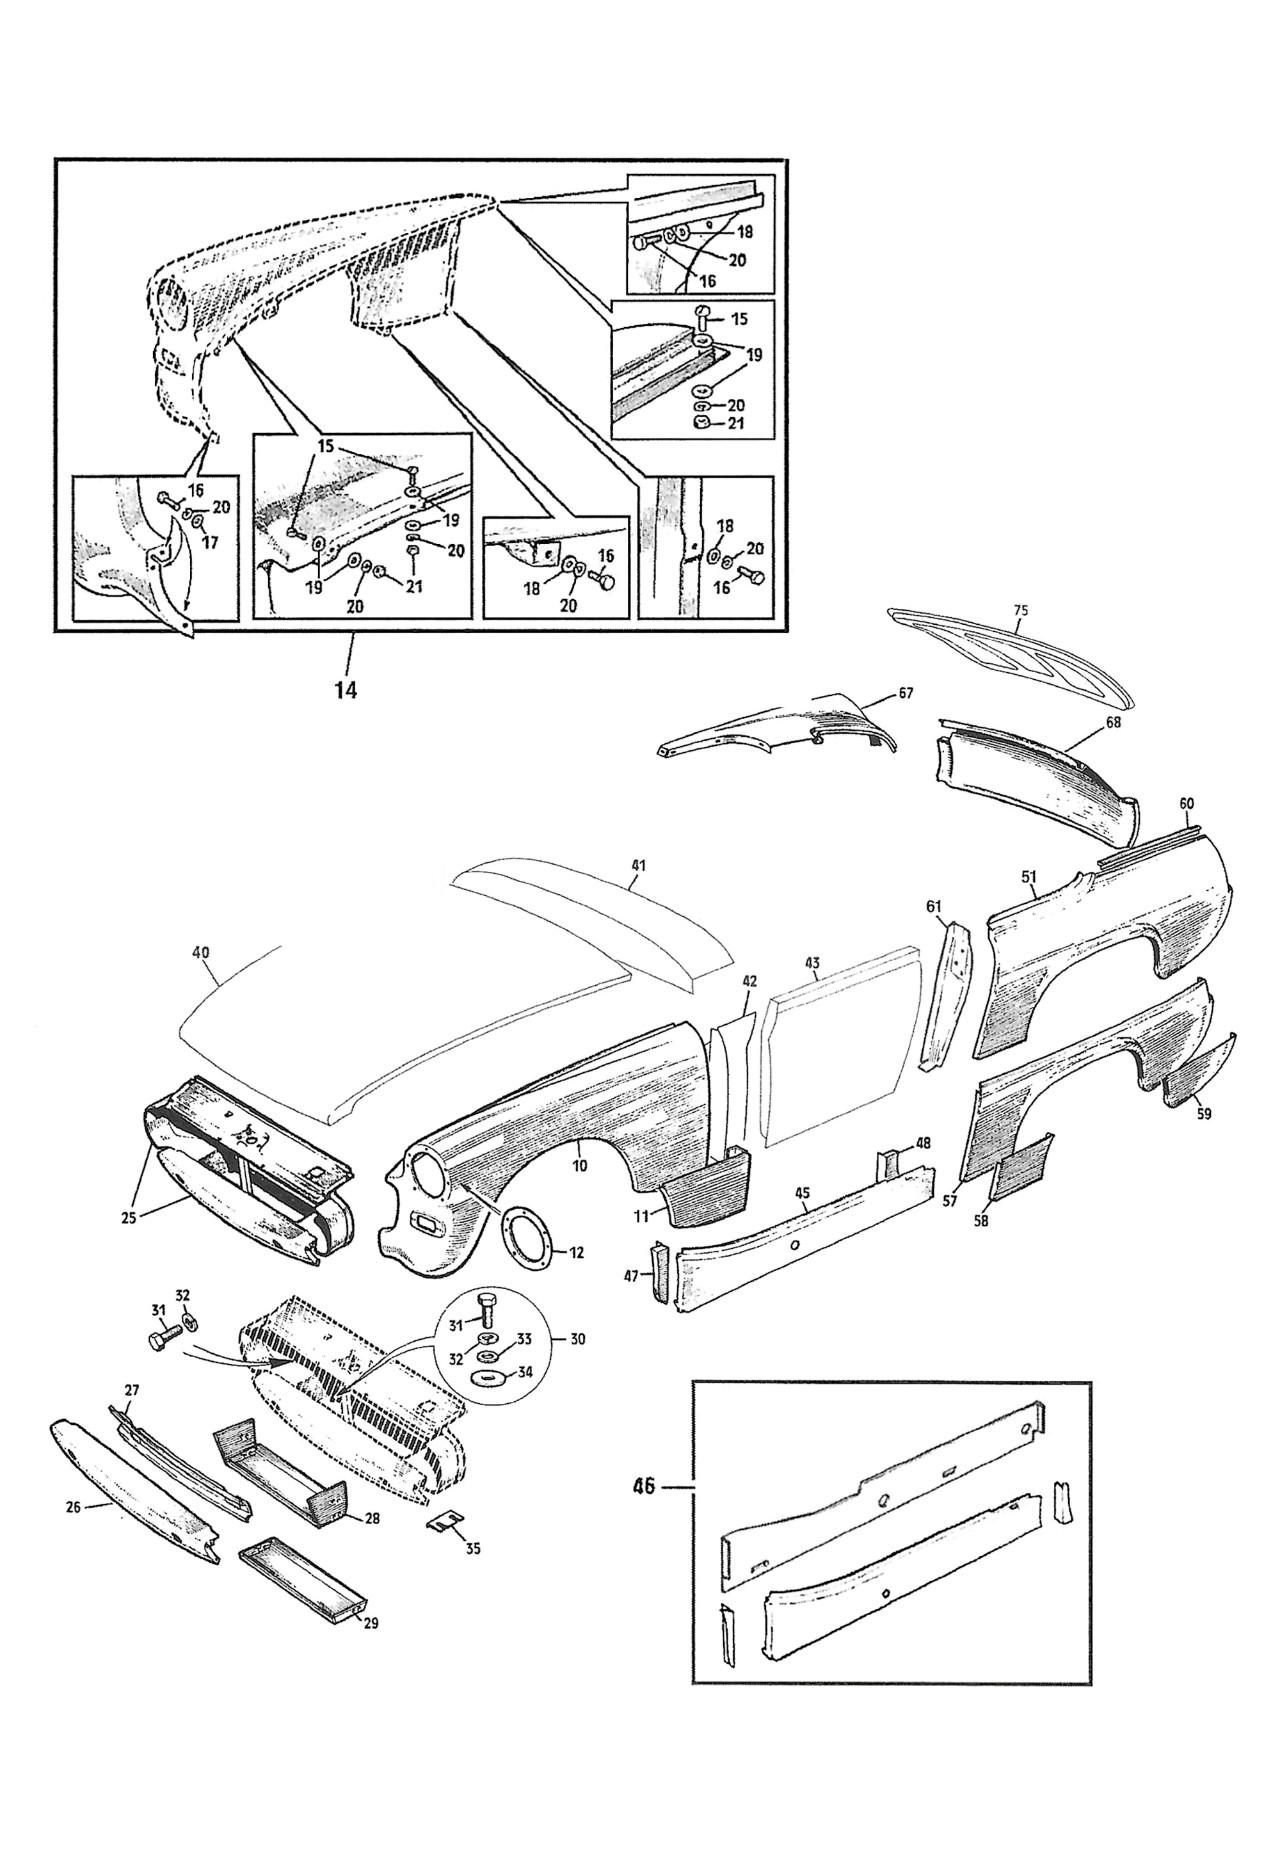 Sprite Catalog Page 12-11